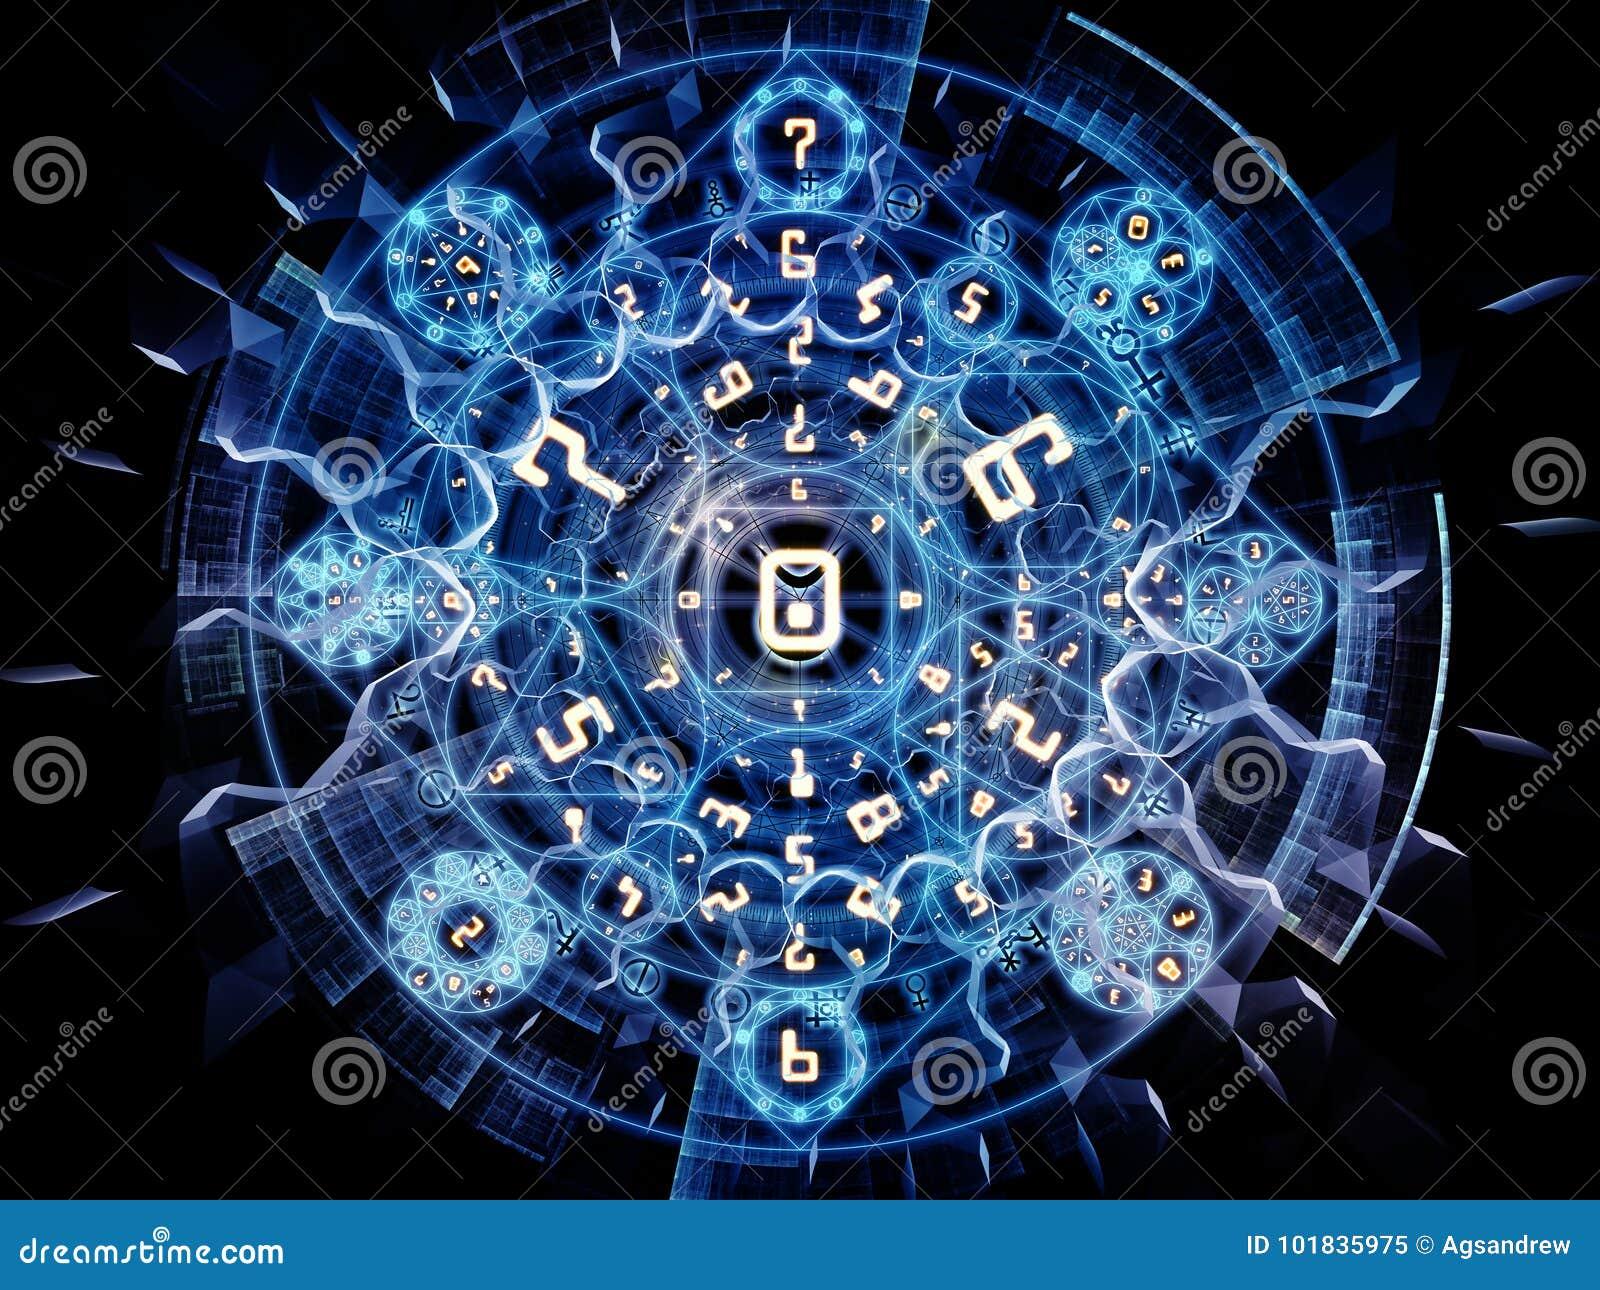 energy of symbolic meaning stock illustration illustration of information 101835975 https www dreamstime com energy symbolic meaning numeric connection series design composed number fractal geometry symbols as metaphor image101835975